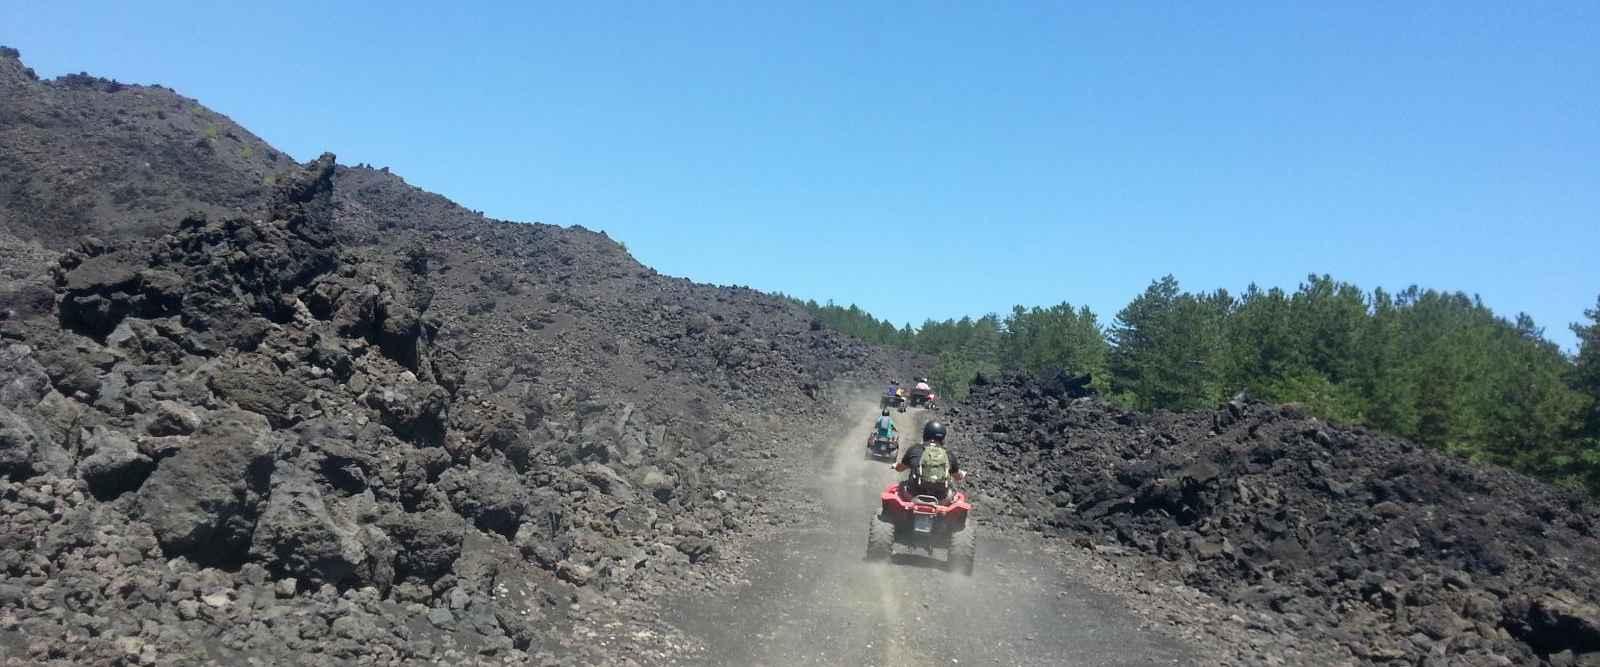 Etna Volcano by Quad Bike